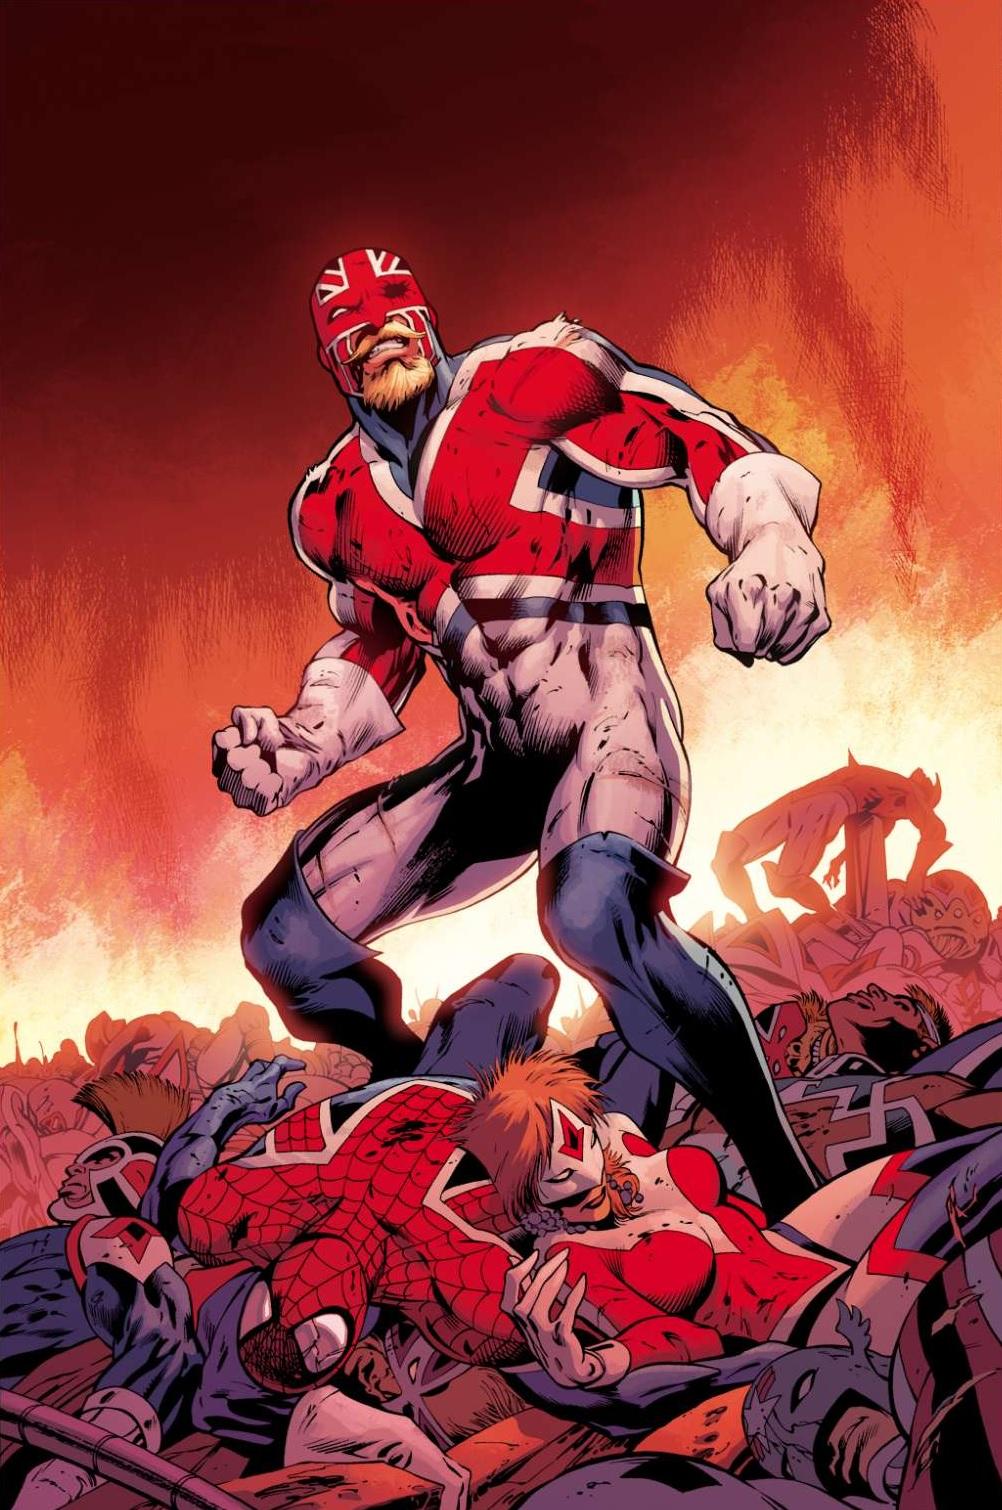 New Avengers vol. 3 #30